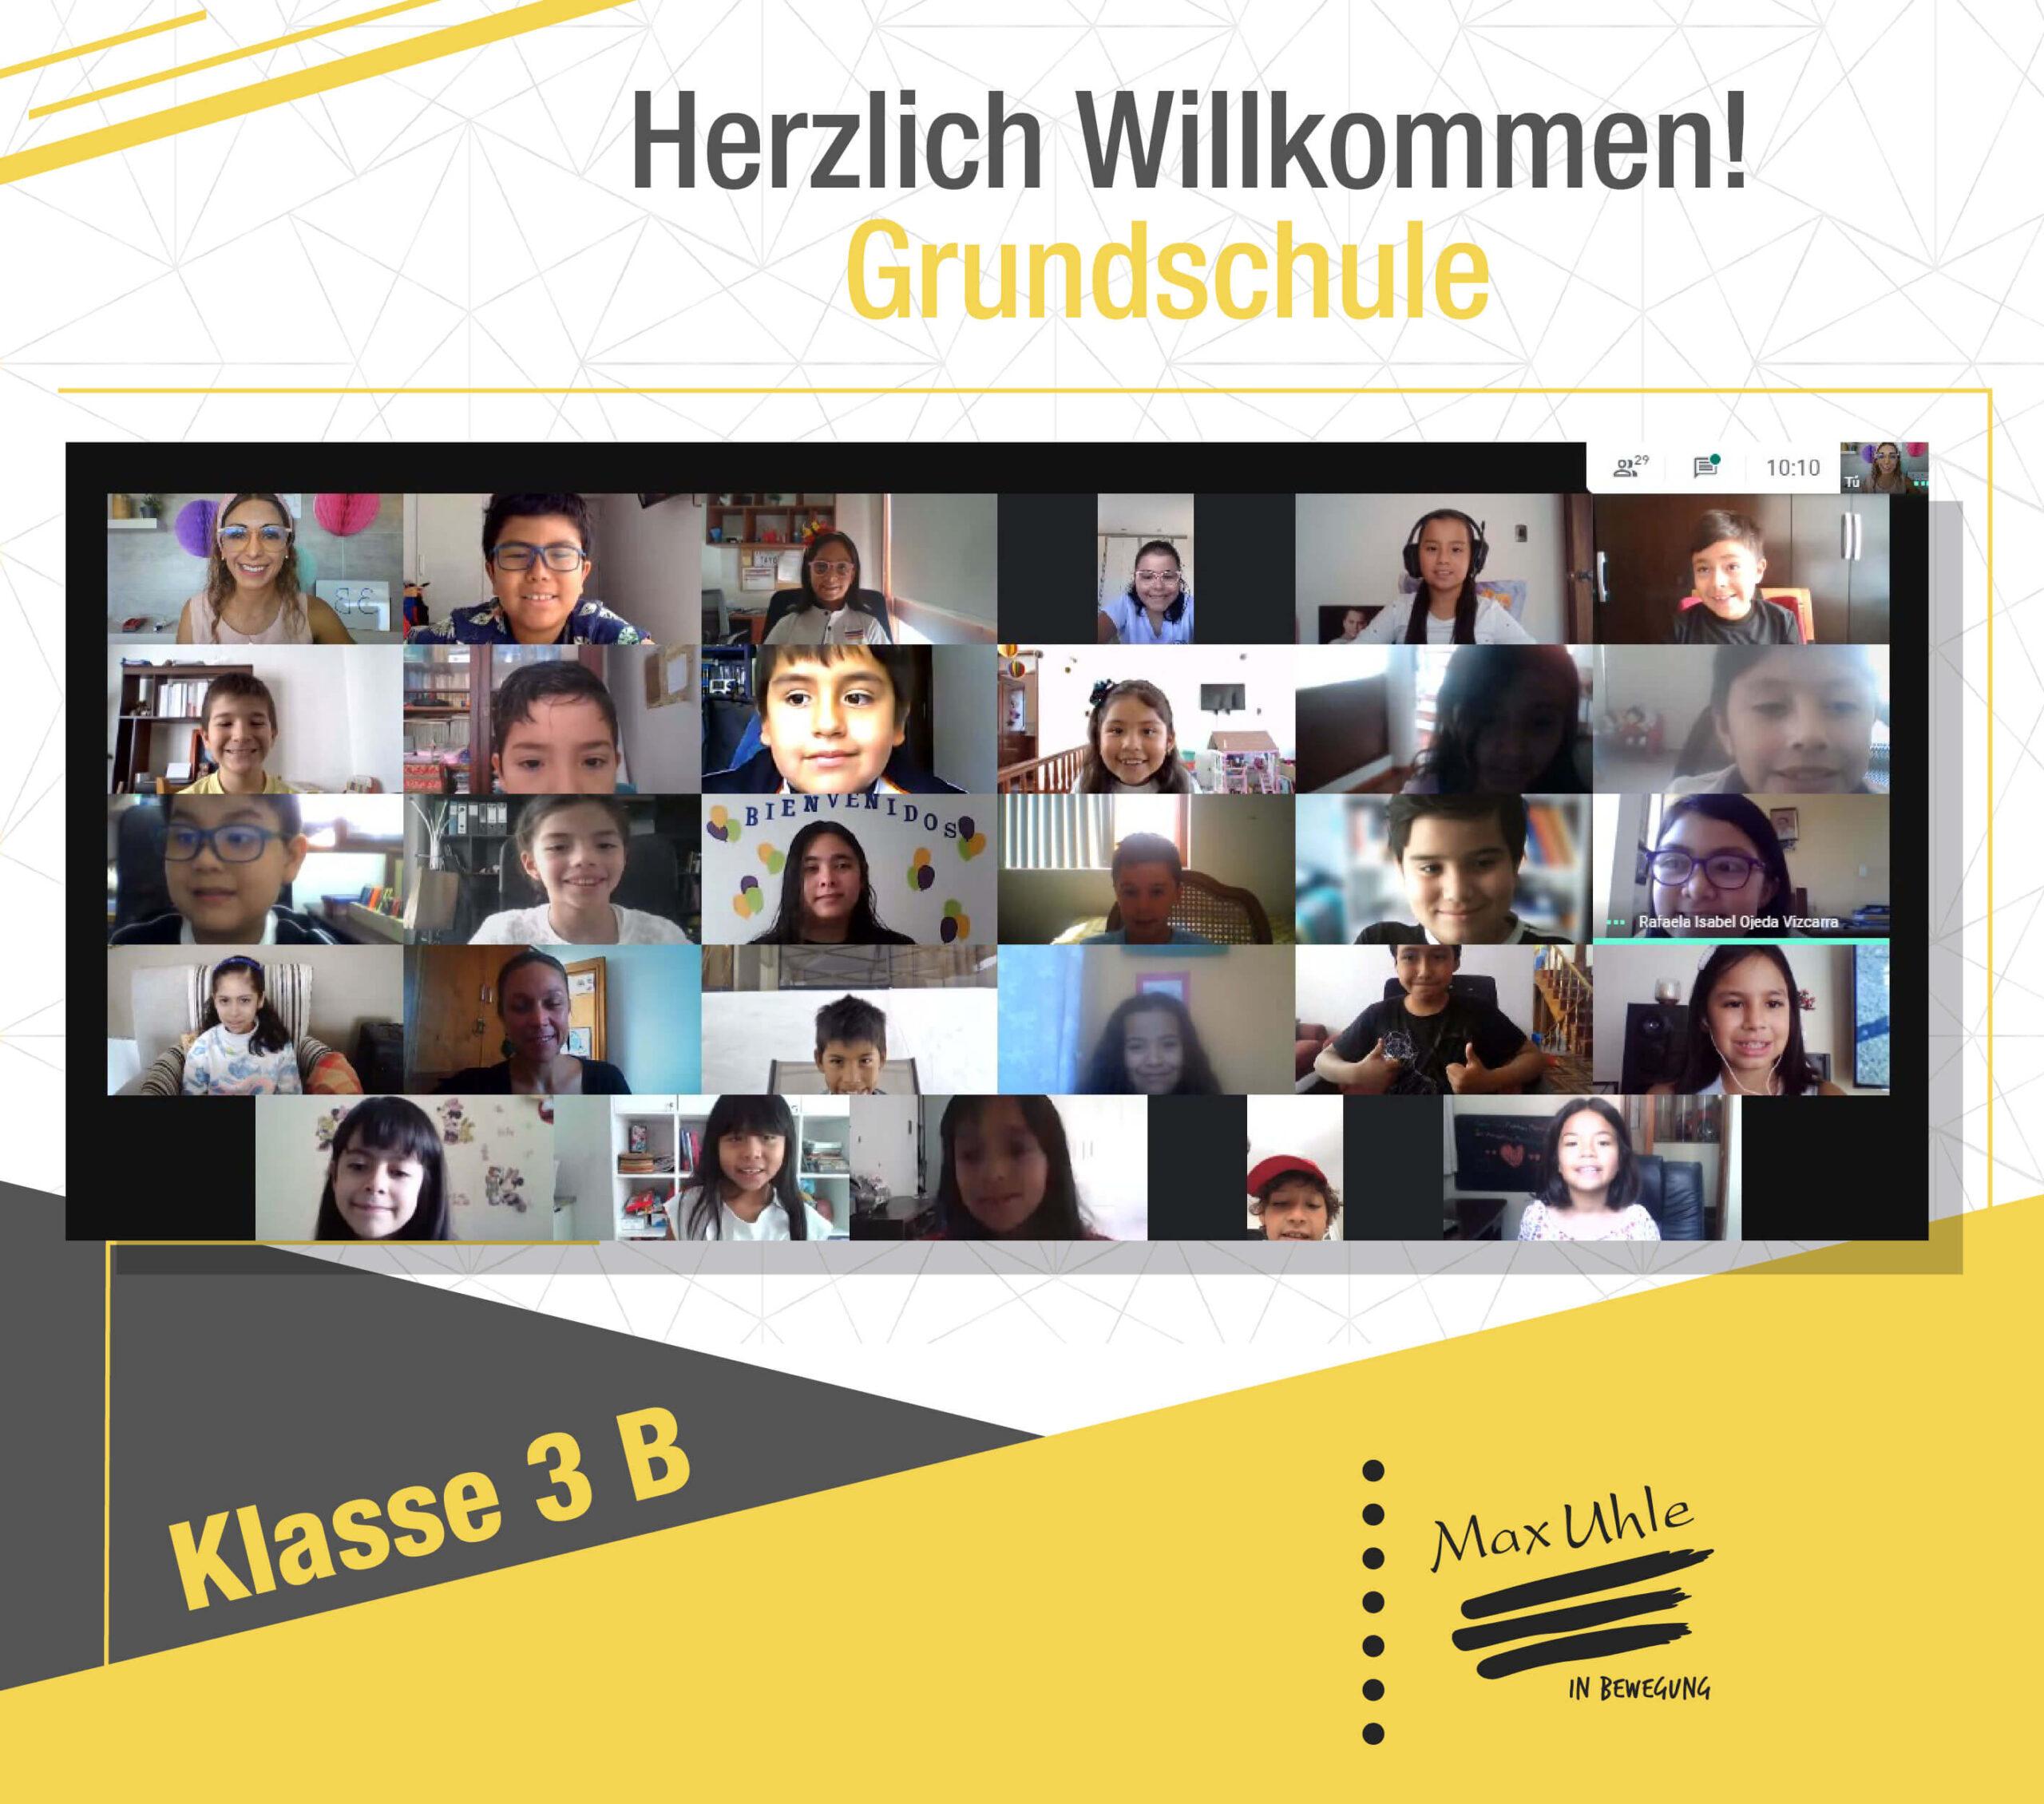 regreso a clases 2021 Grundschule 3B